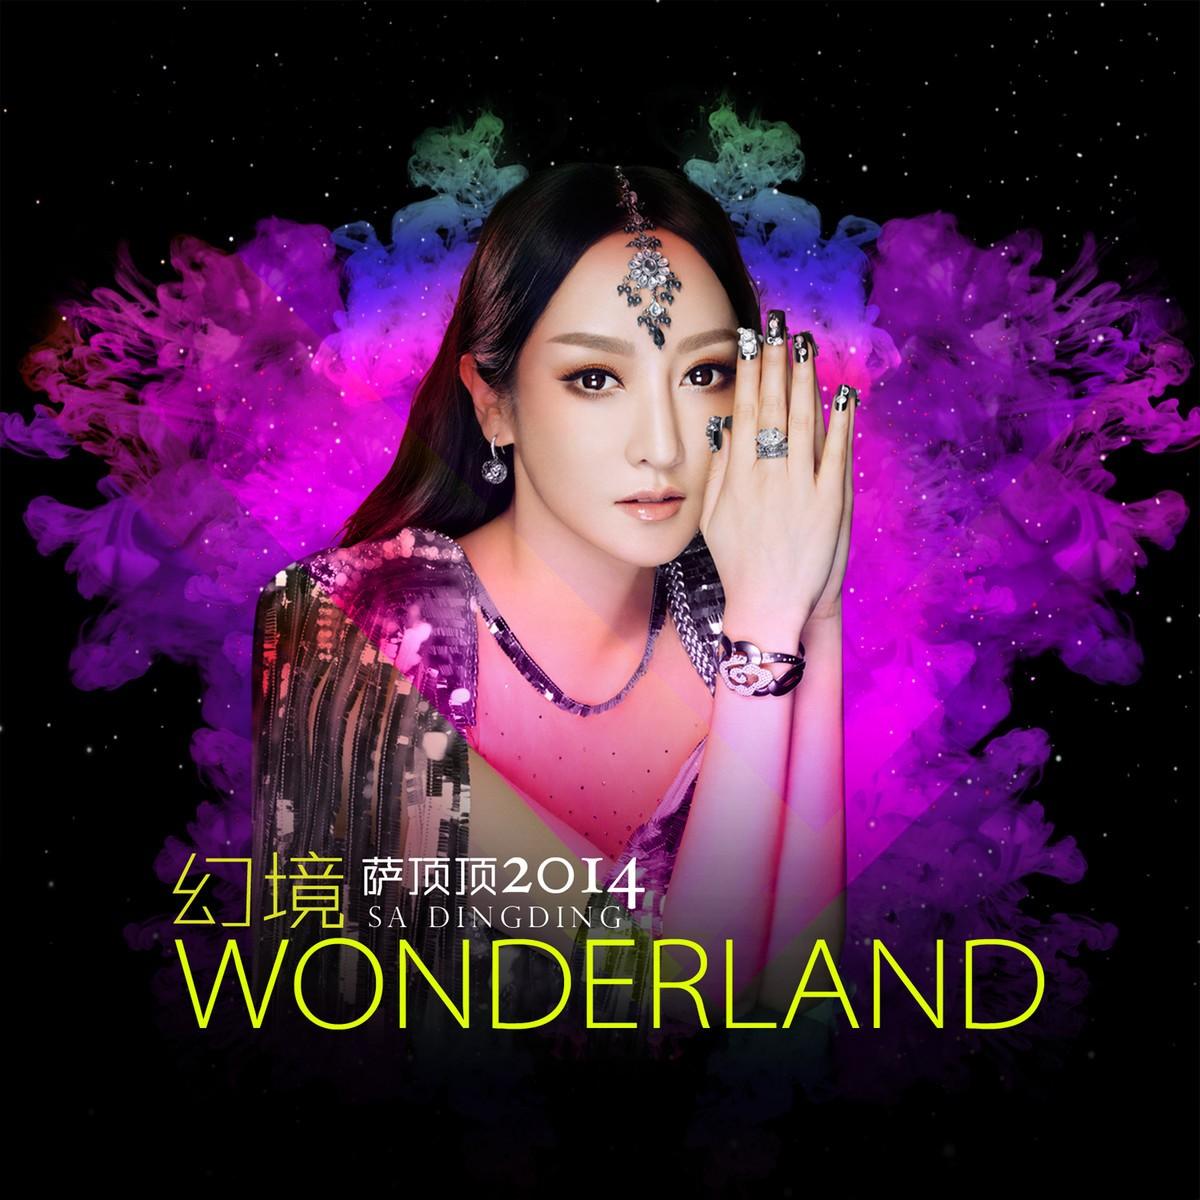 20170521.1655.5 Sa Dingding - Wonderland cover.jpg